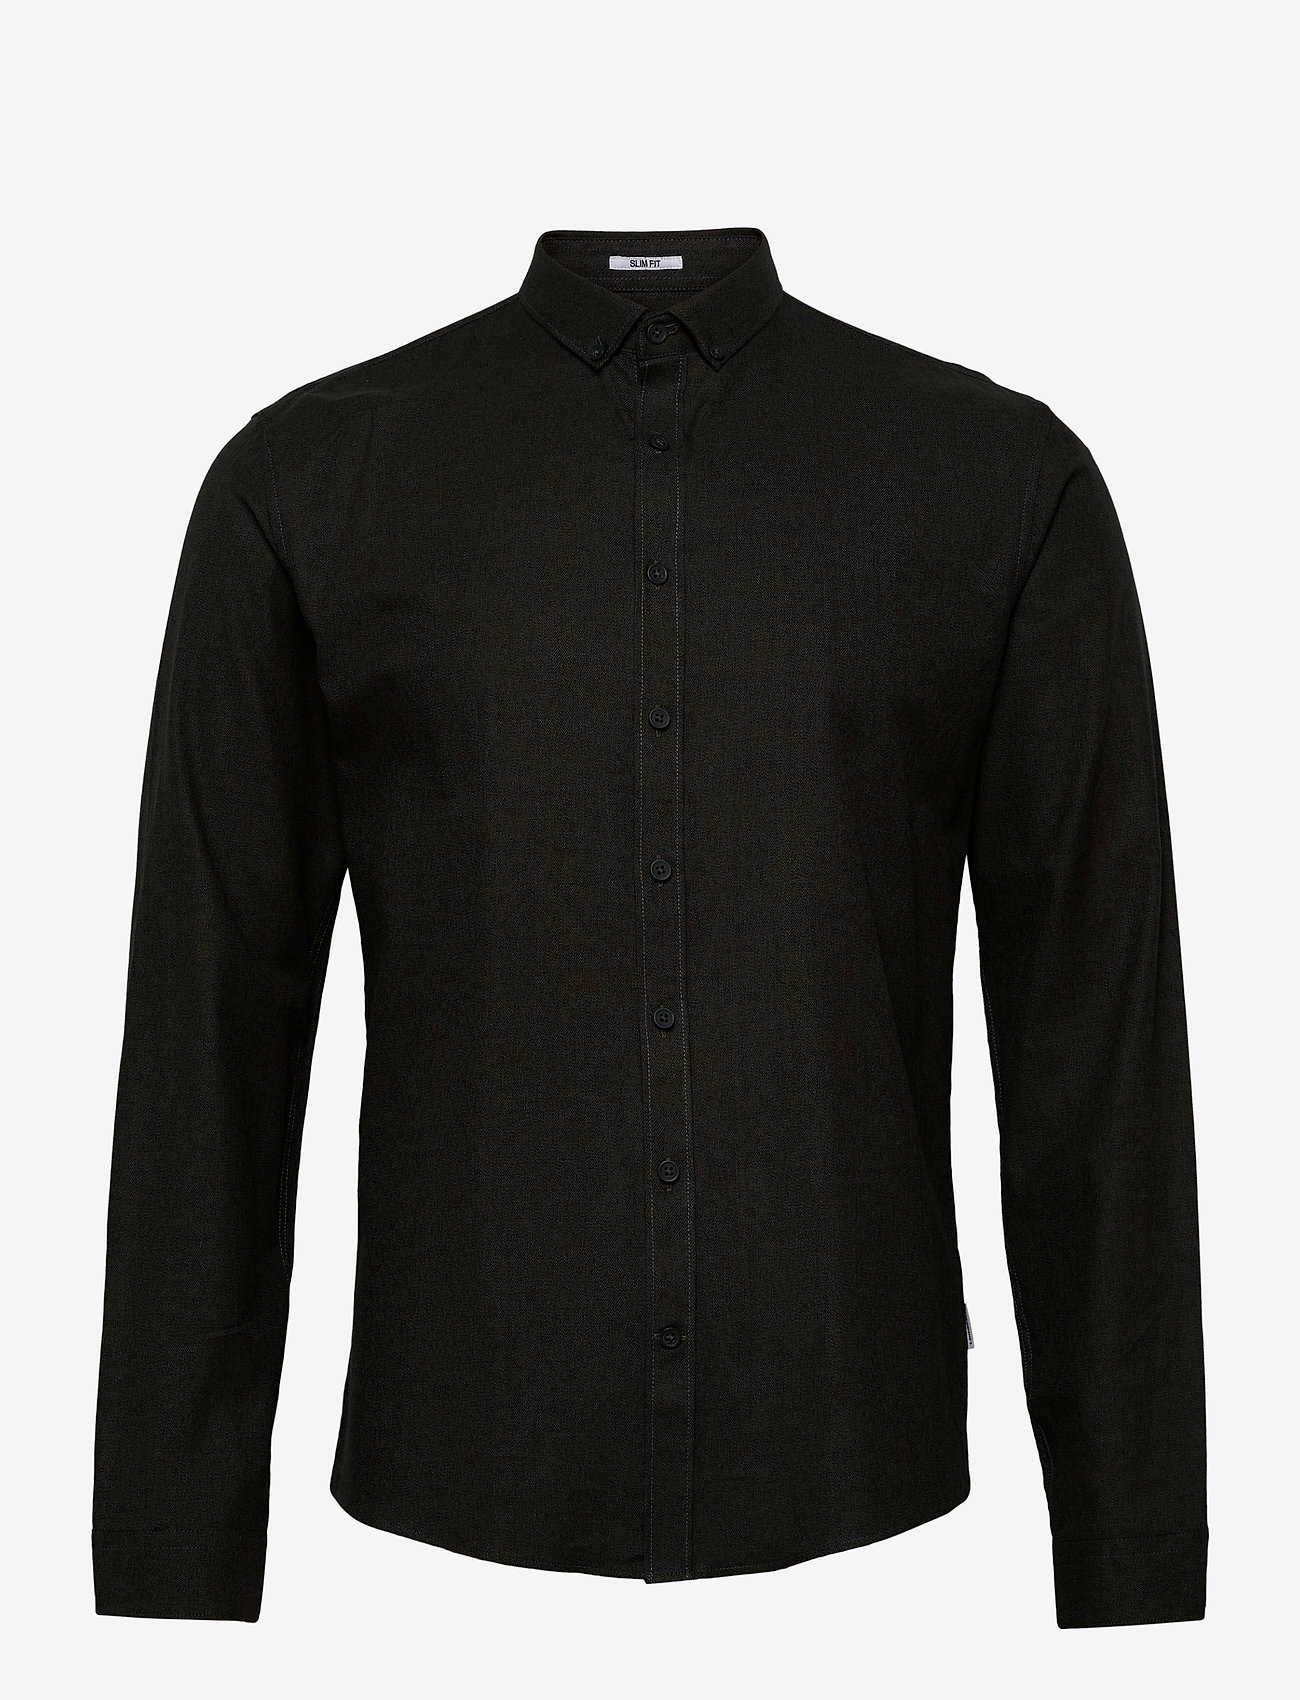 Lindbergh - Mouliné stretch shirt L/S - basic shirts - army - 0